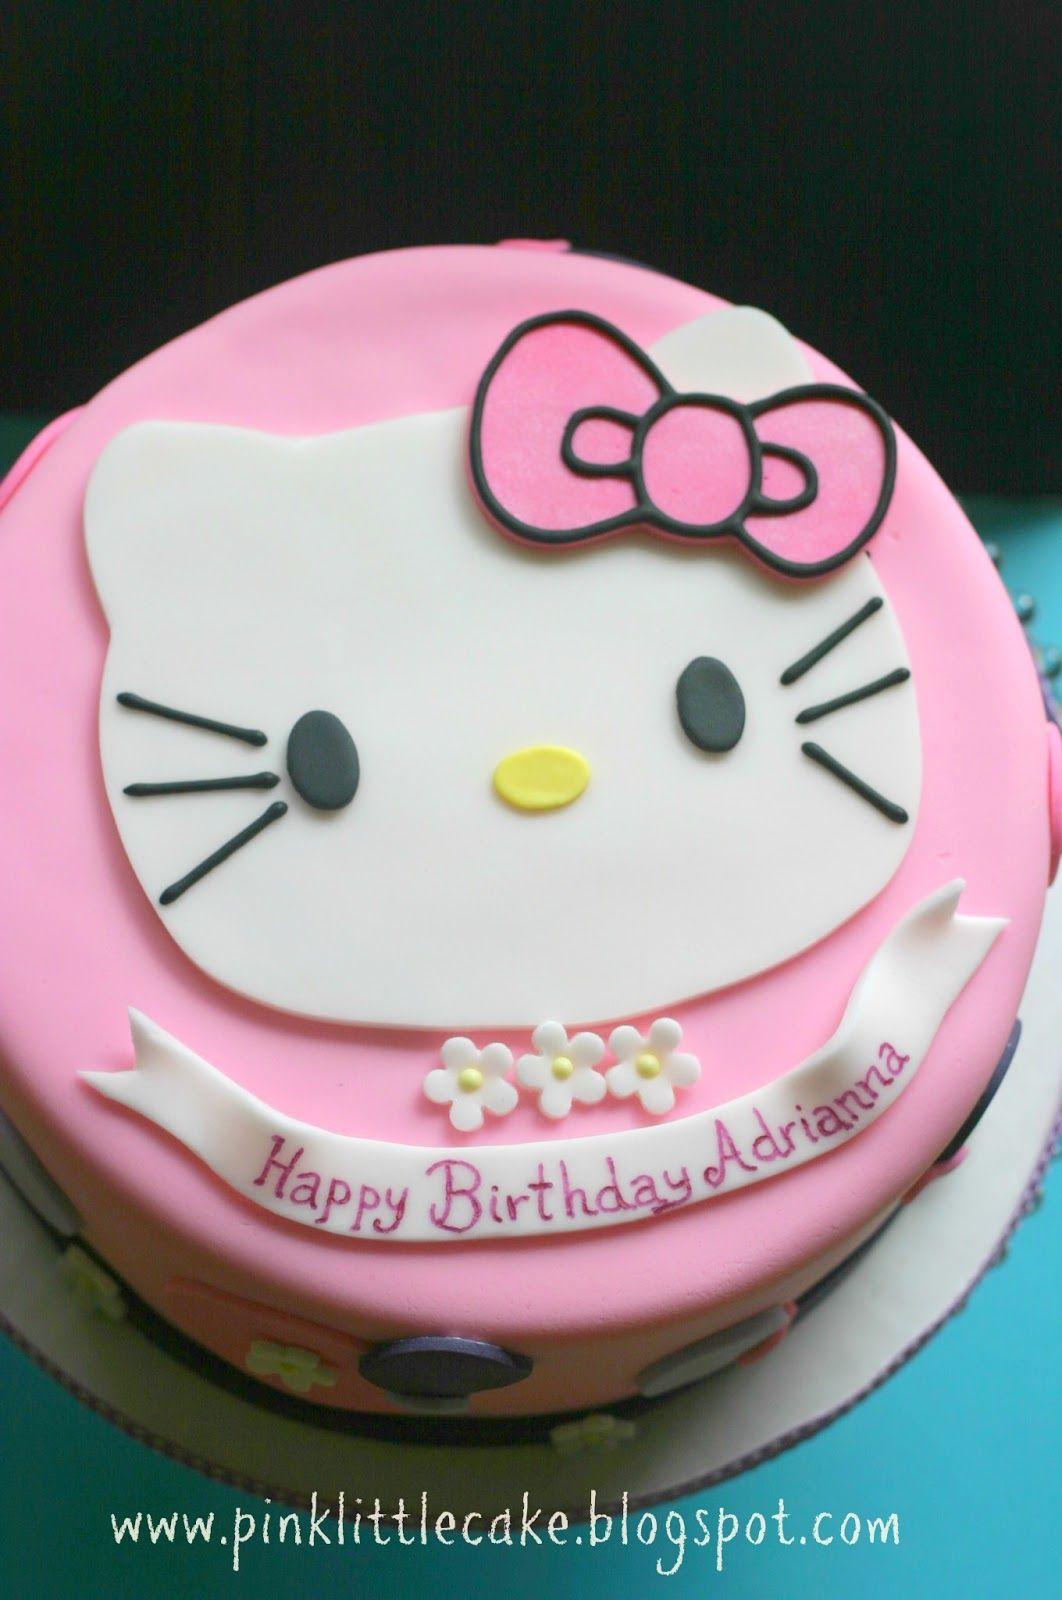 Birthday Cake 7 Years Old Girl